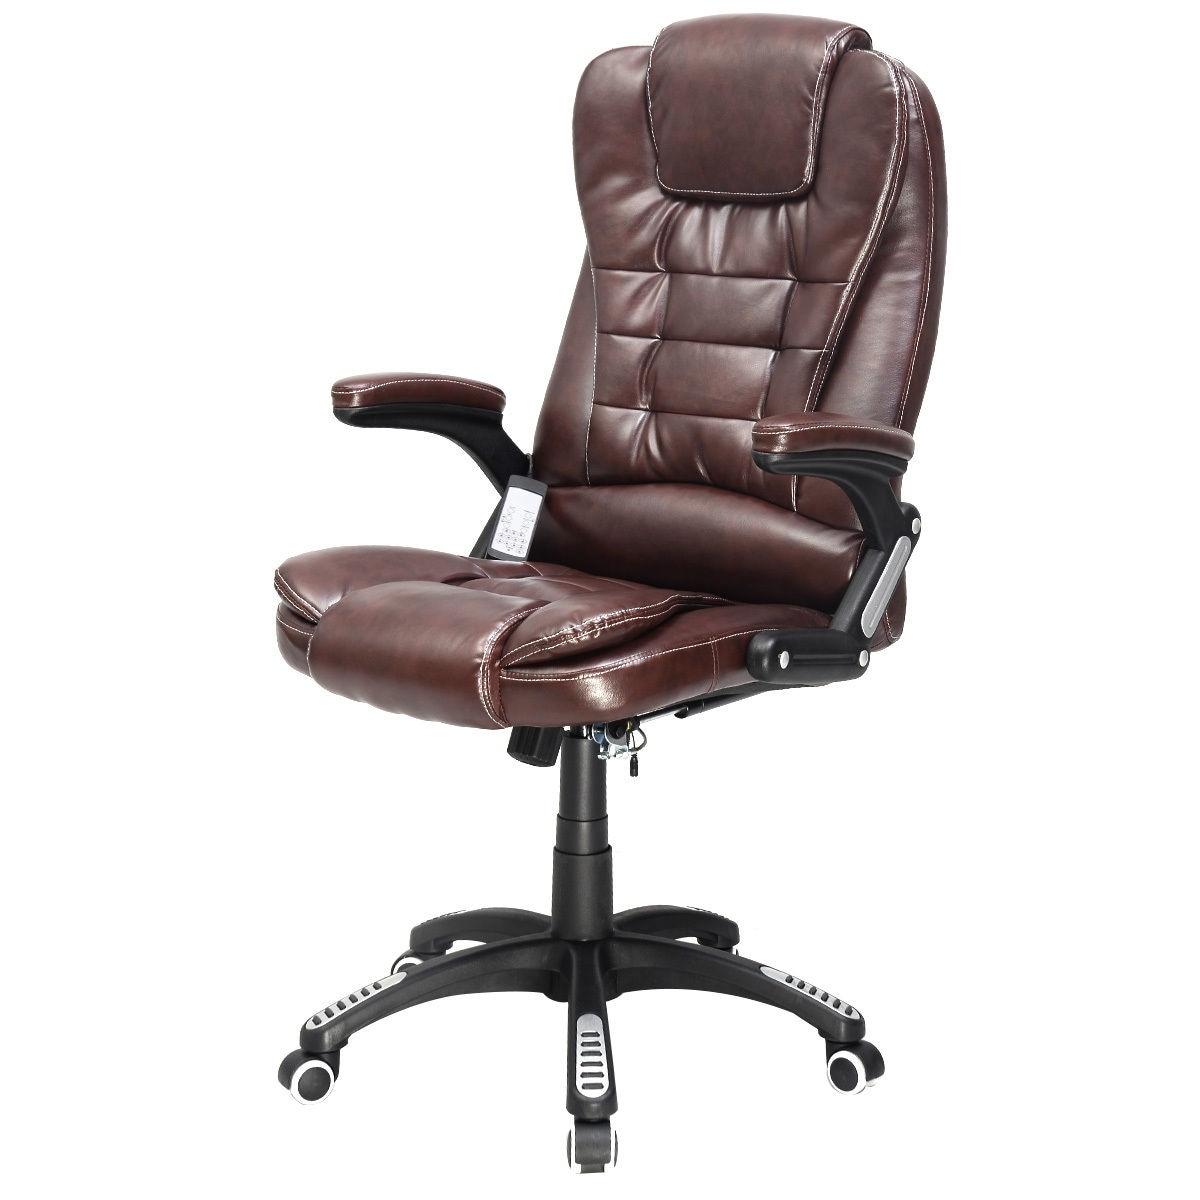 Shop Costway Executive Ergonomic Computer Desk Massage Chair Vibrating Home Office Overstock 18299784